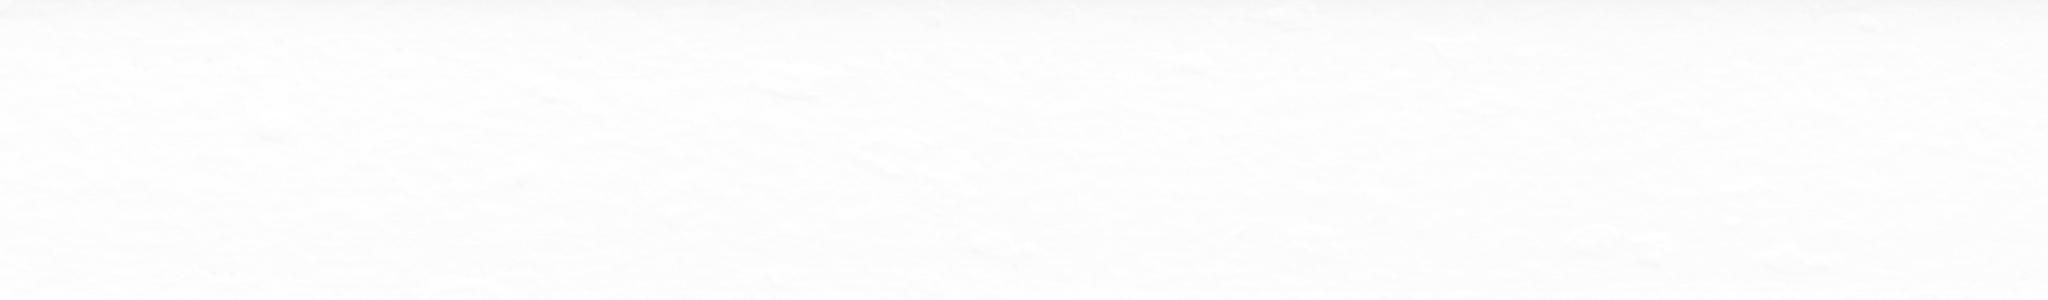 HU 104401 ABS hrana bílá beton perla XH